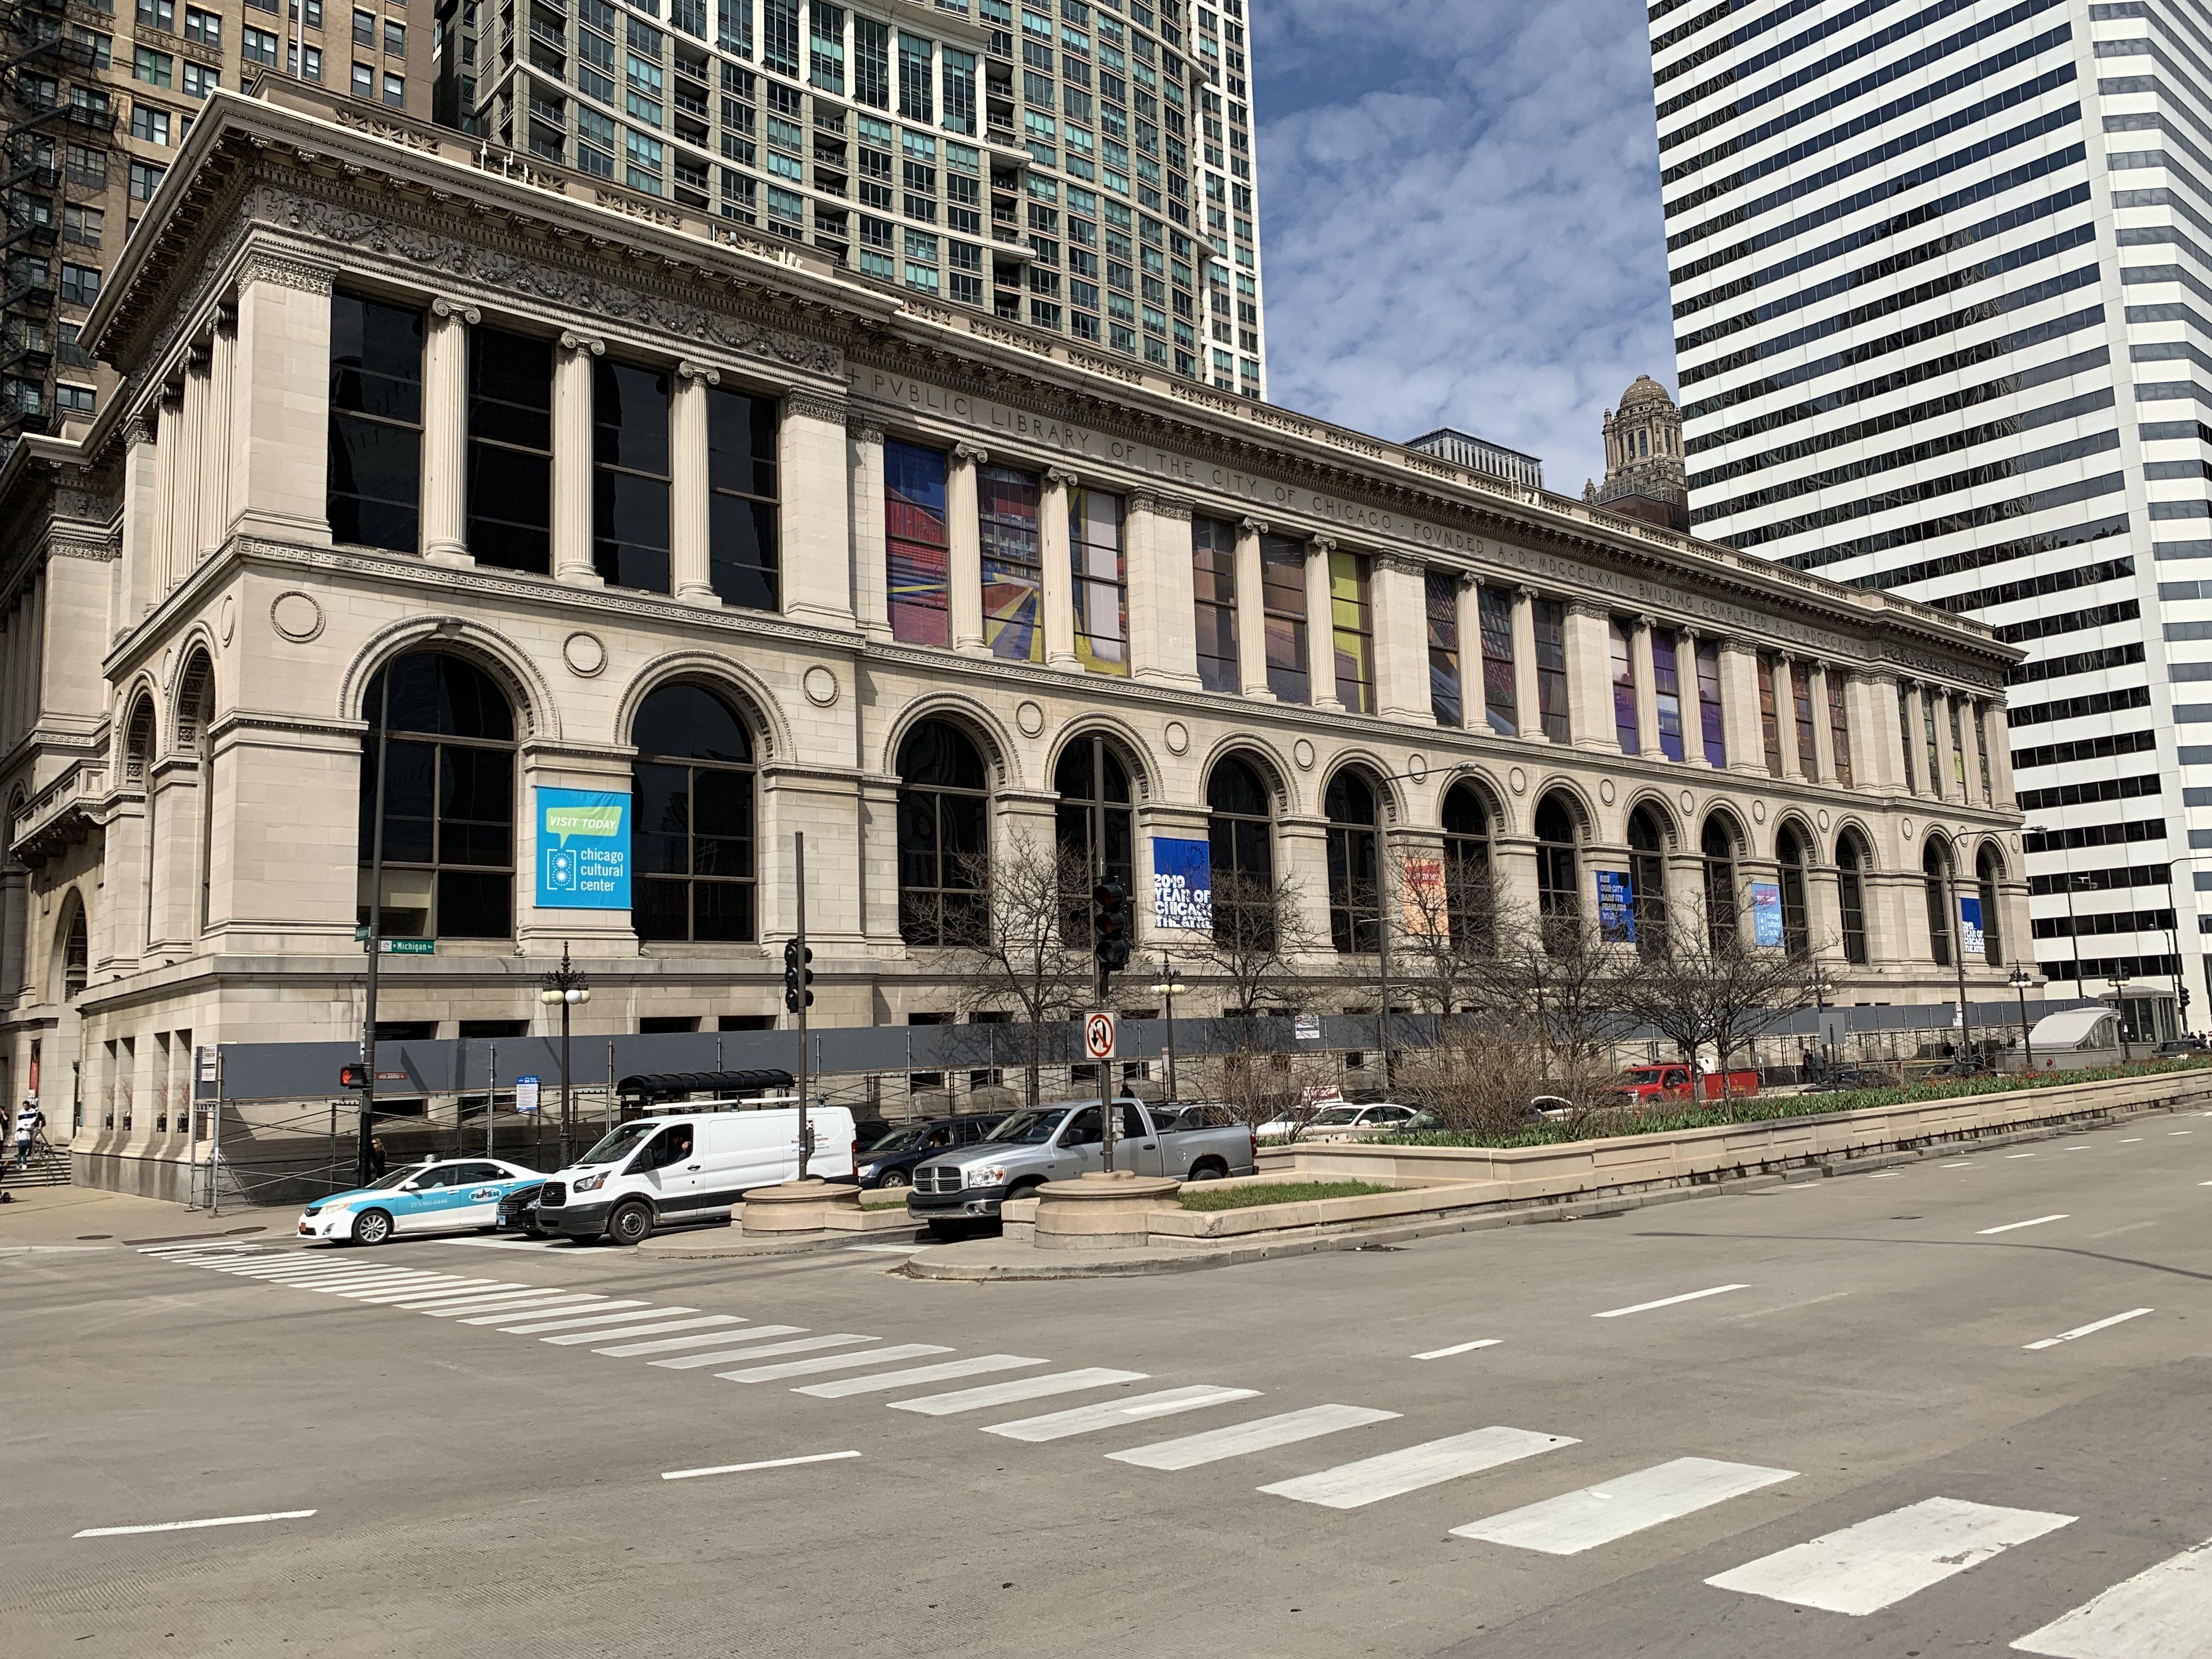 Chicago Cultural Center pedestrian canopy scaffold 1